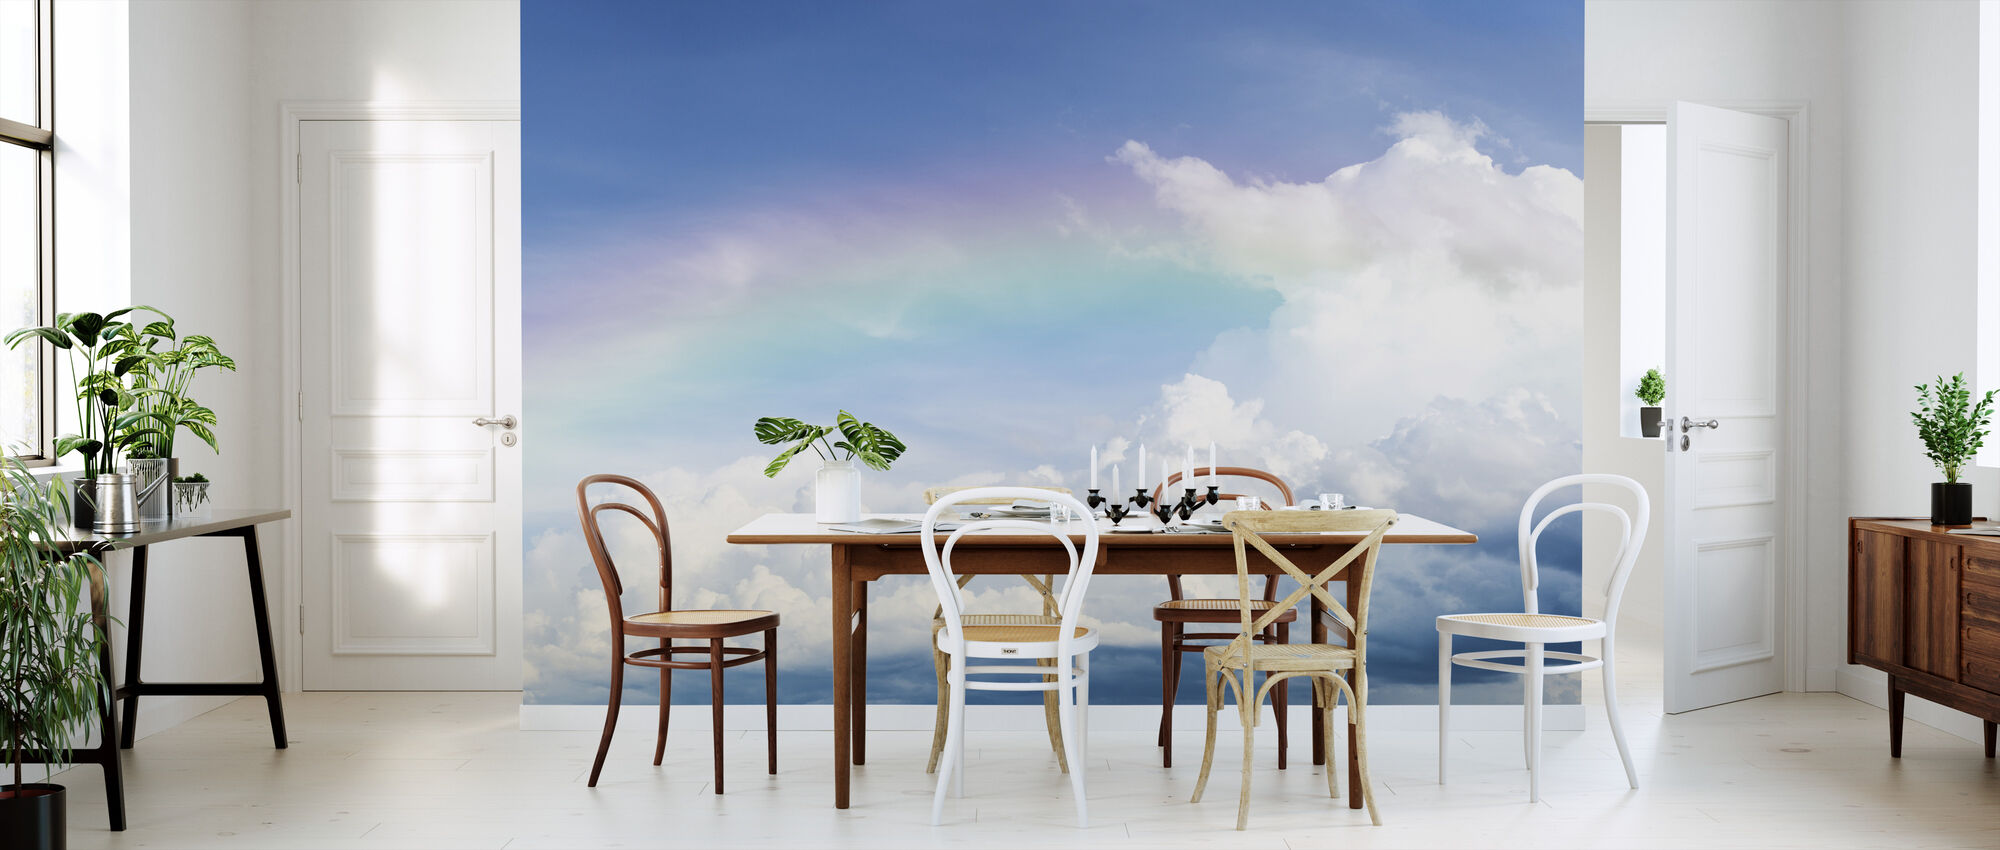 Rainbow on Cloudy Sky - Wallpaper - Kitchen